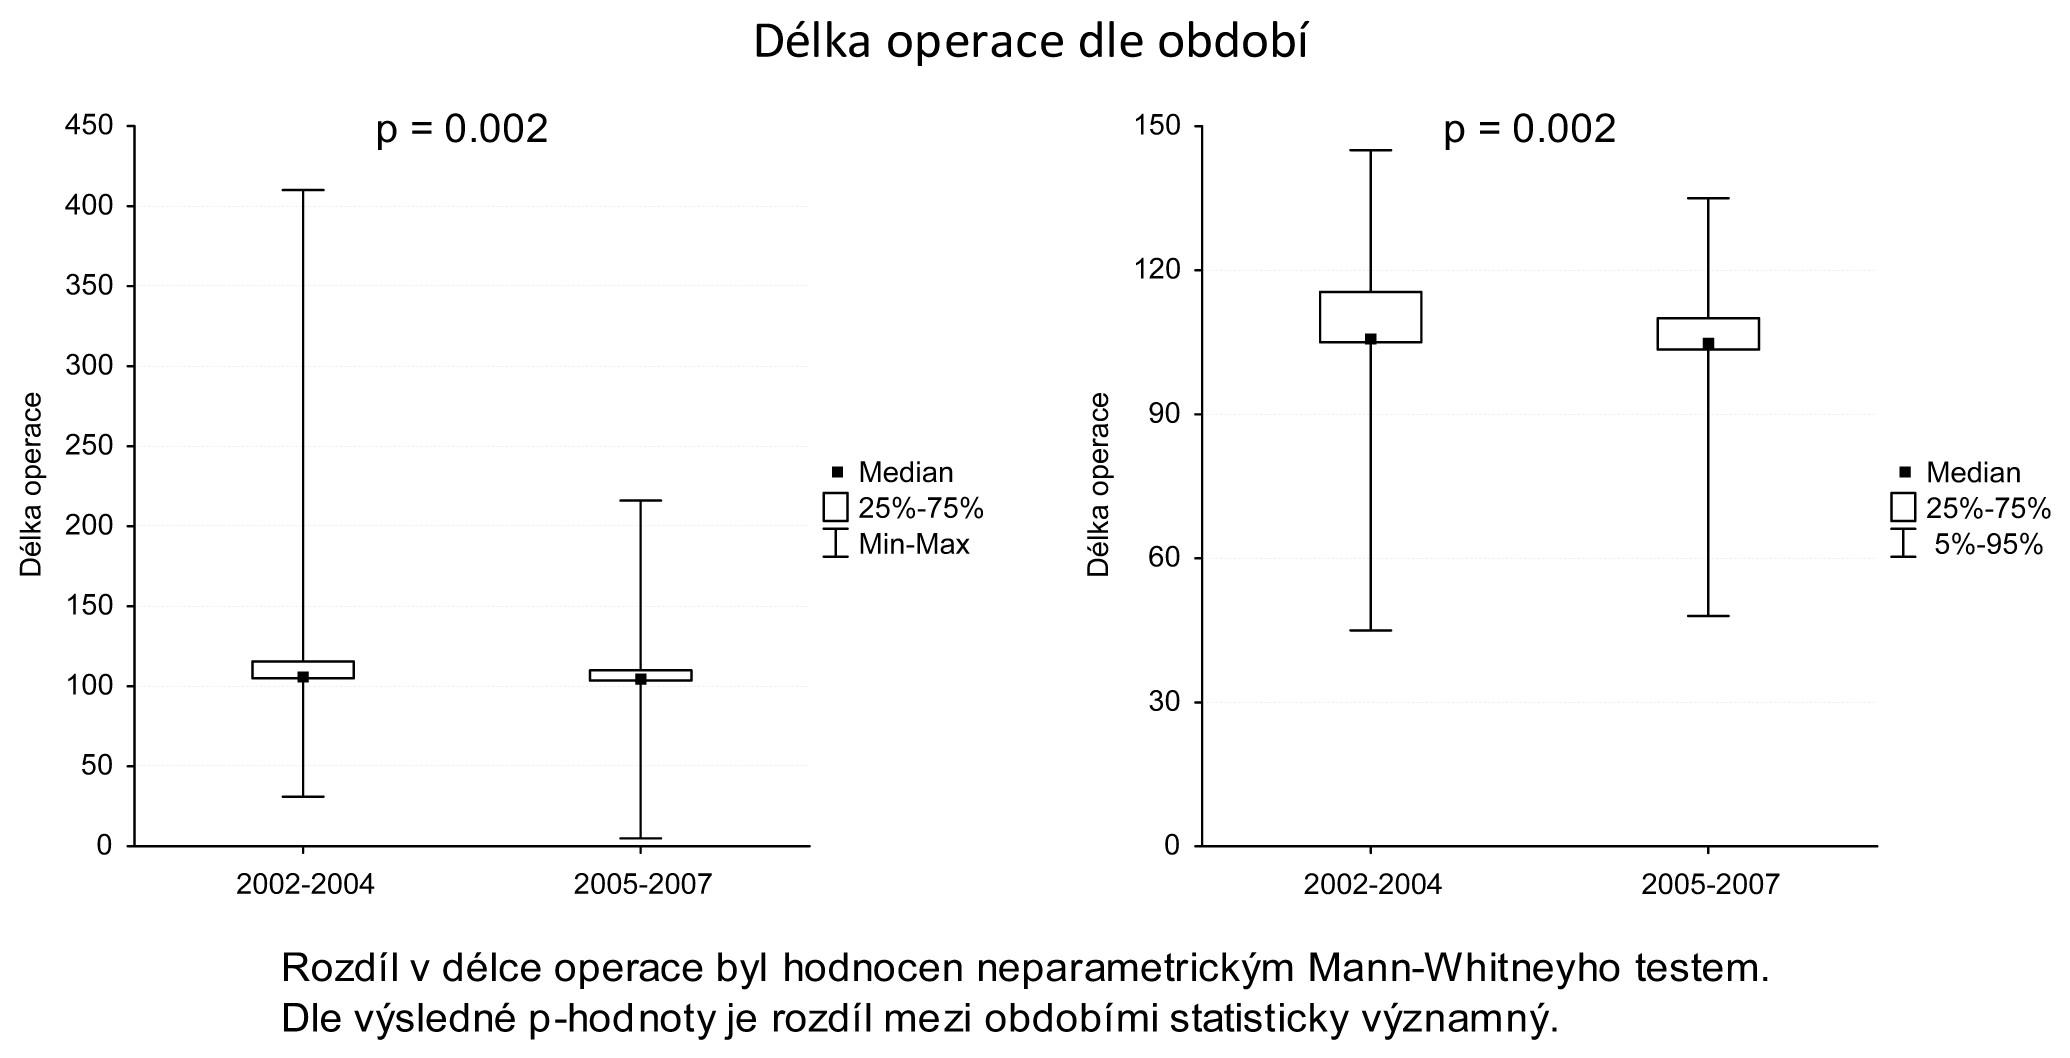 Porovnání délky operace v obou souborech Graph 1: Comparison of the surgical procedure duration between the two patient groups